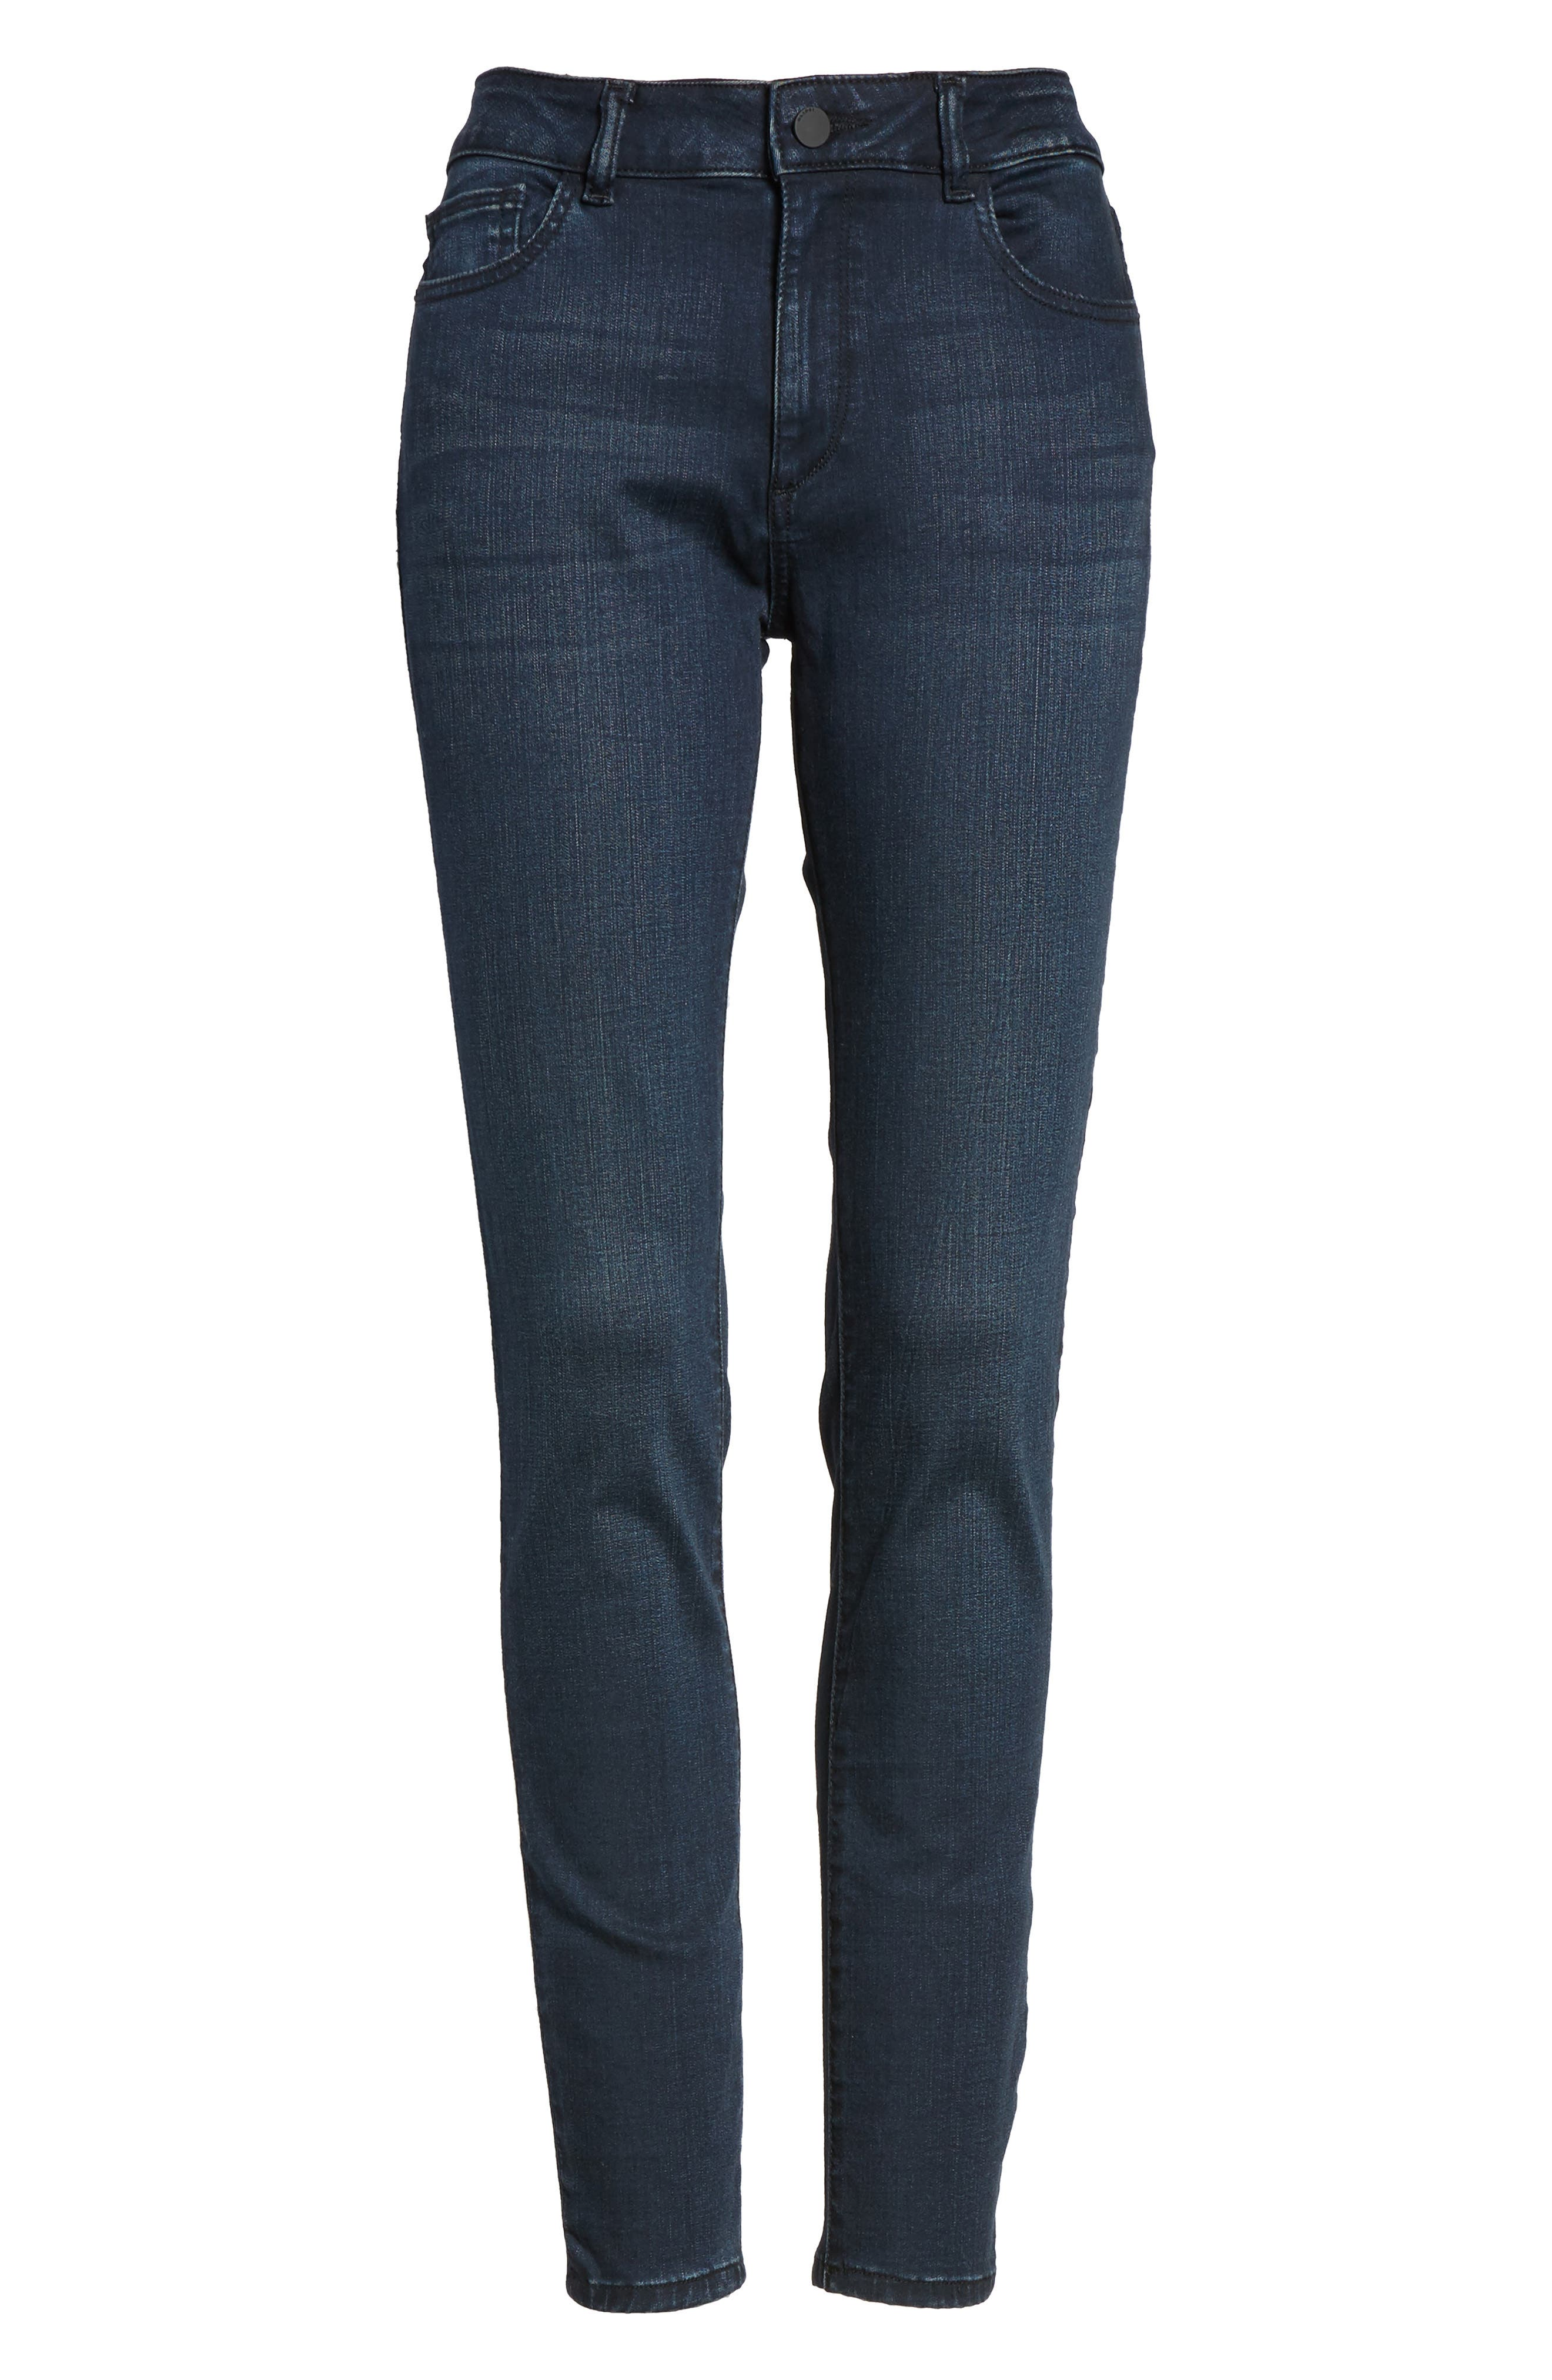 Farrow High Waist Instaslim Skinny Jeans,                             Alternate thumbnail 6, color,                             Equinox